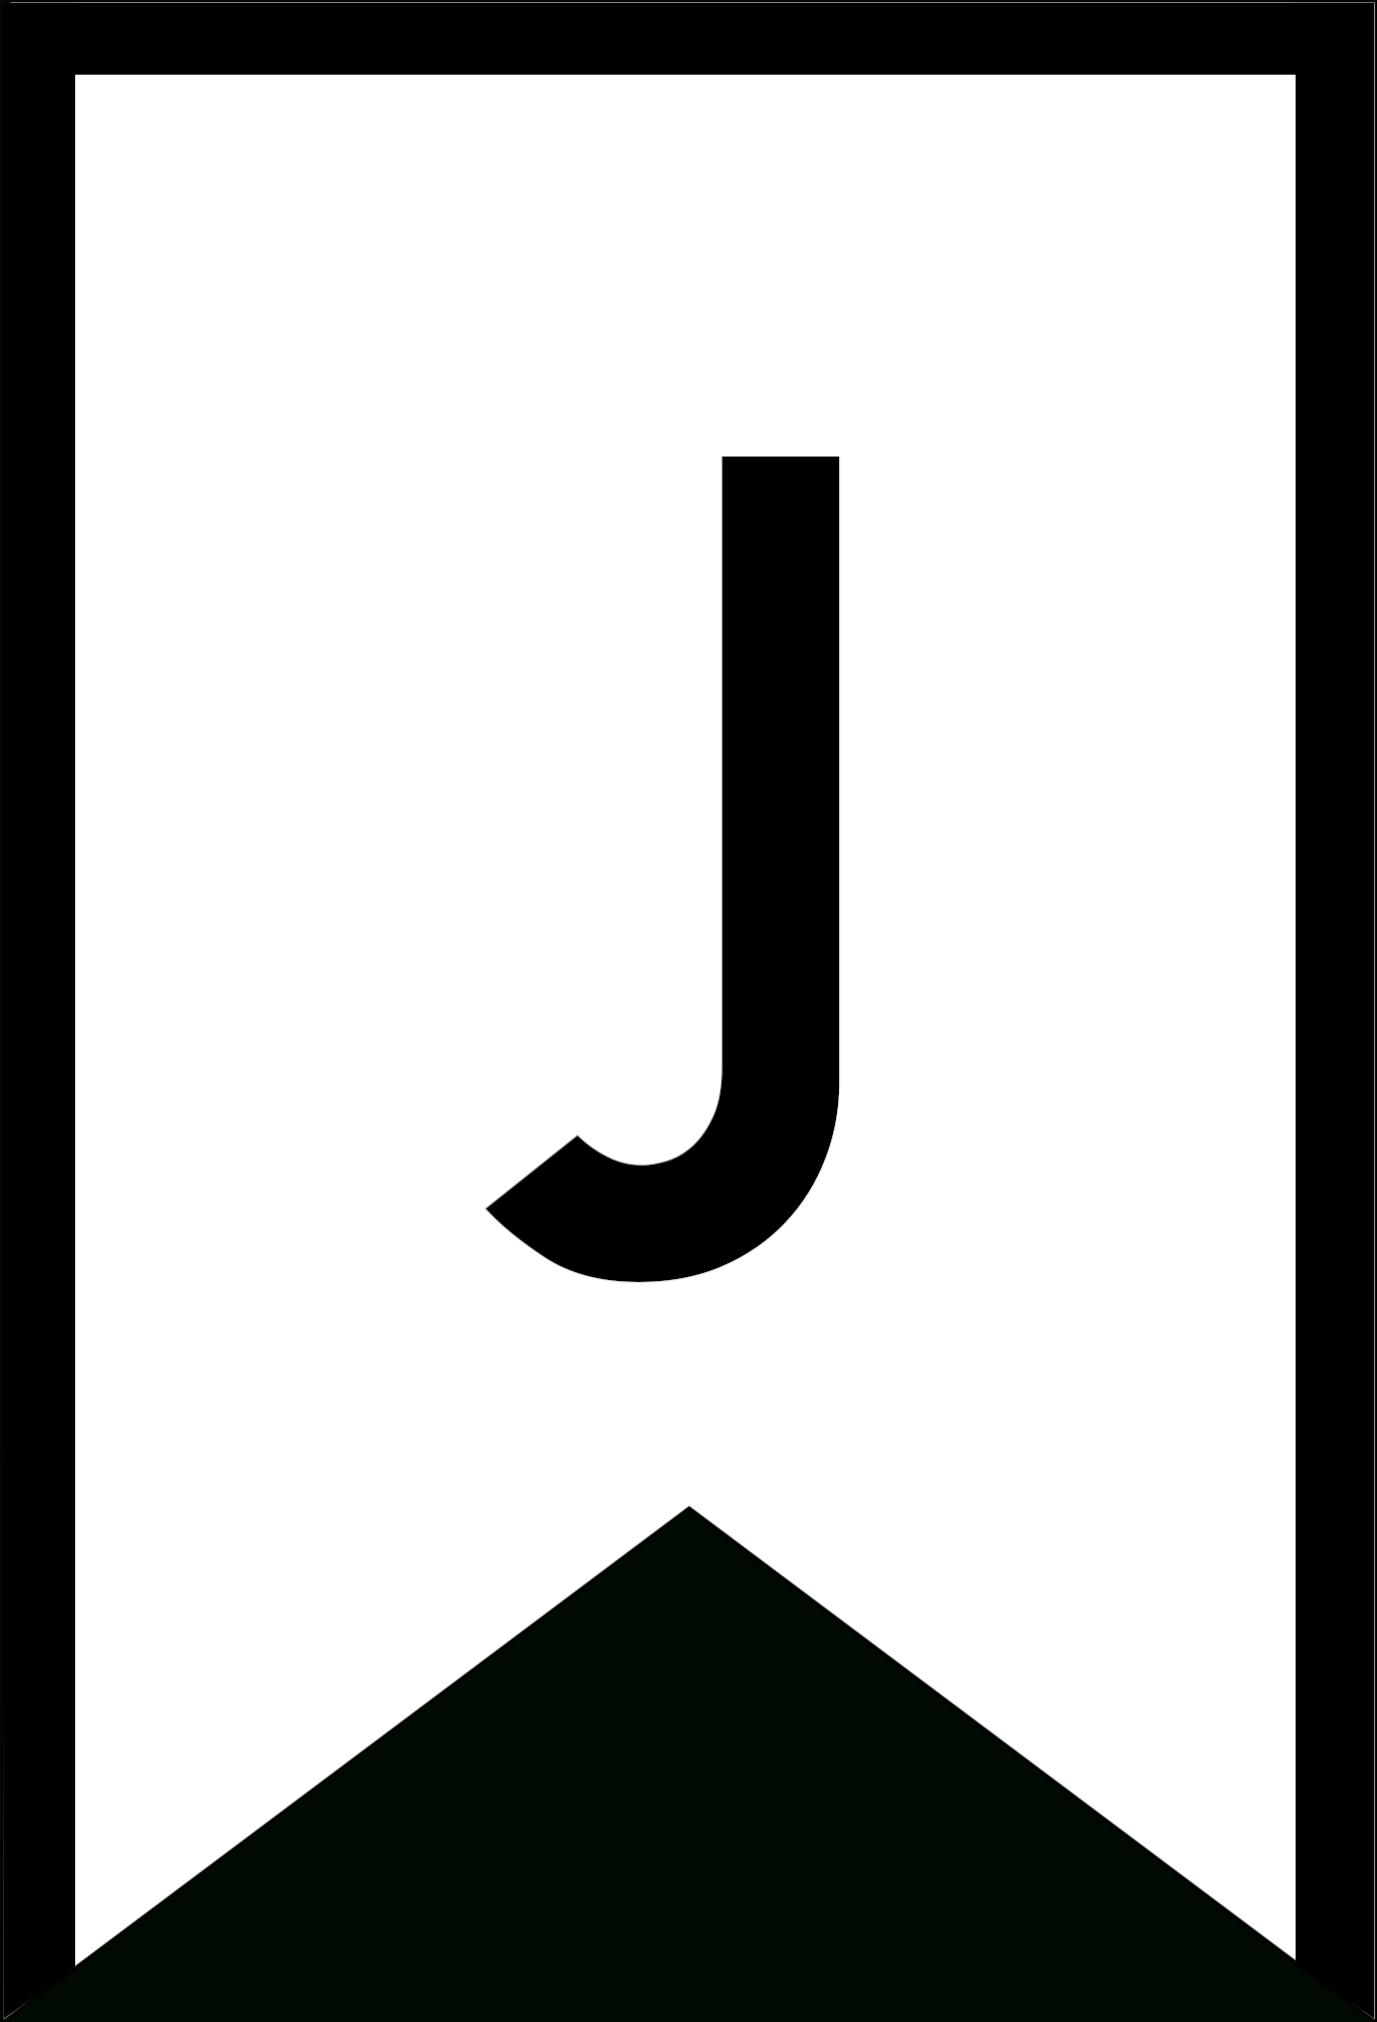 Printable Letter For Banners - Karati.ald2014 Intended For Printable Letter Templates For Banners